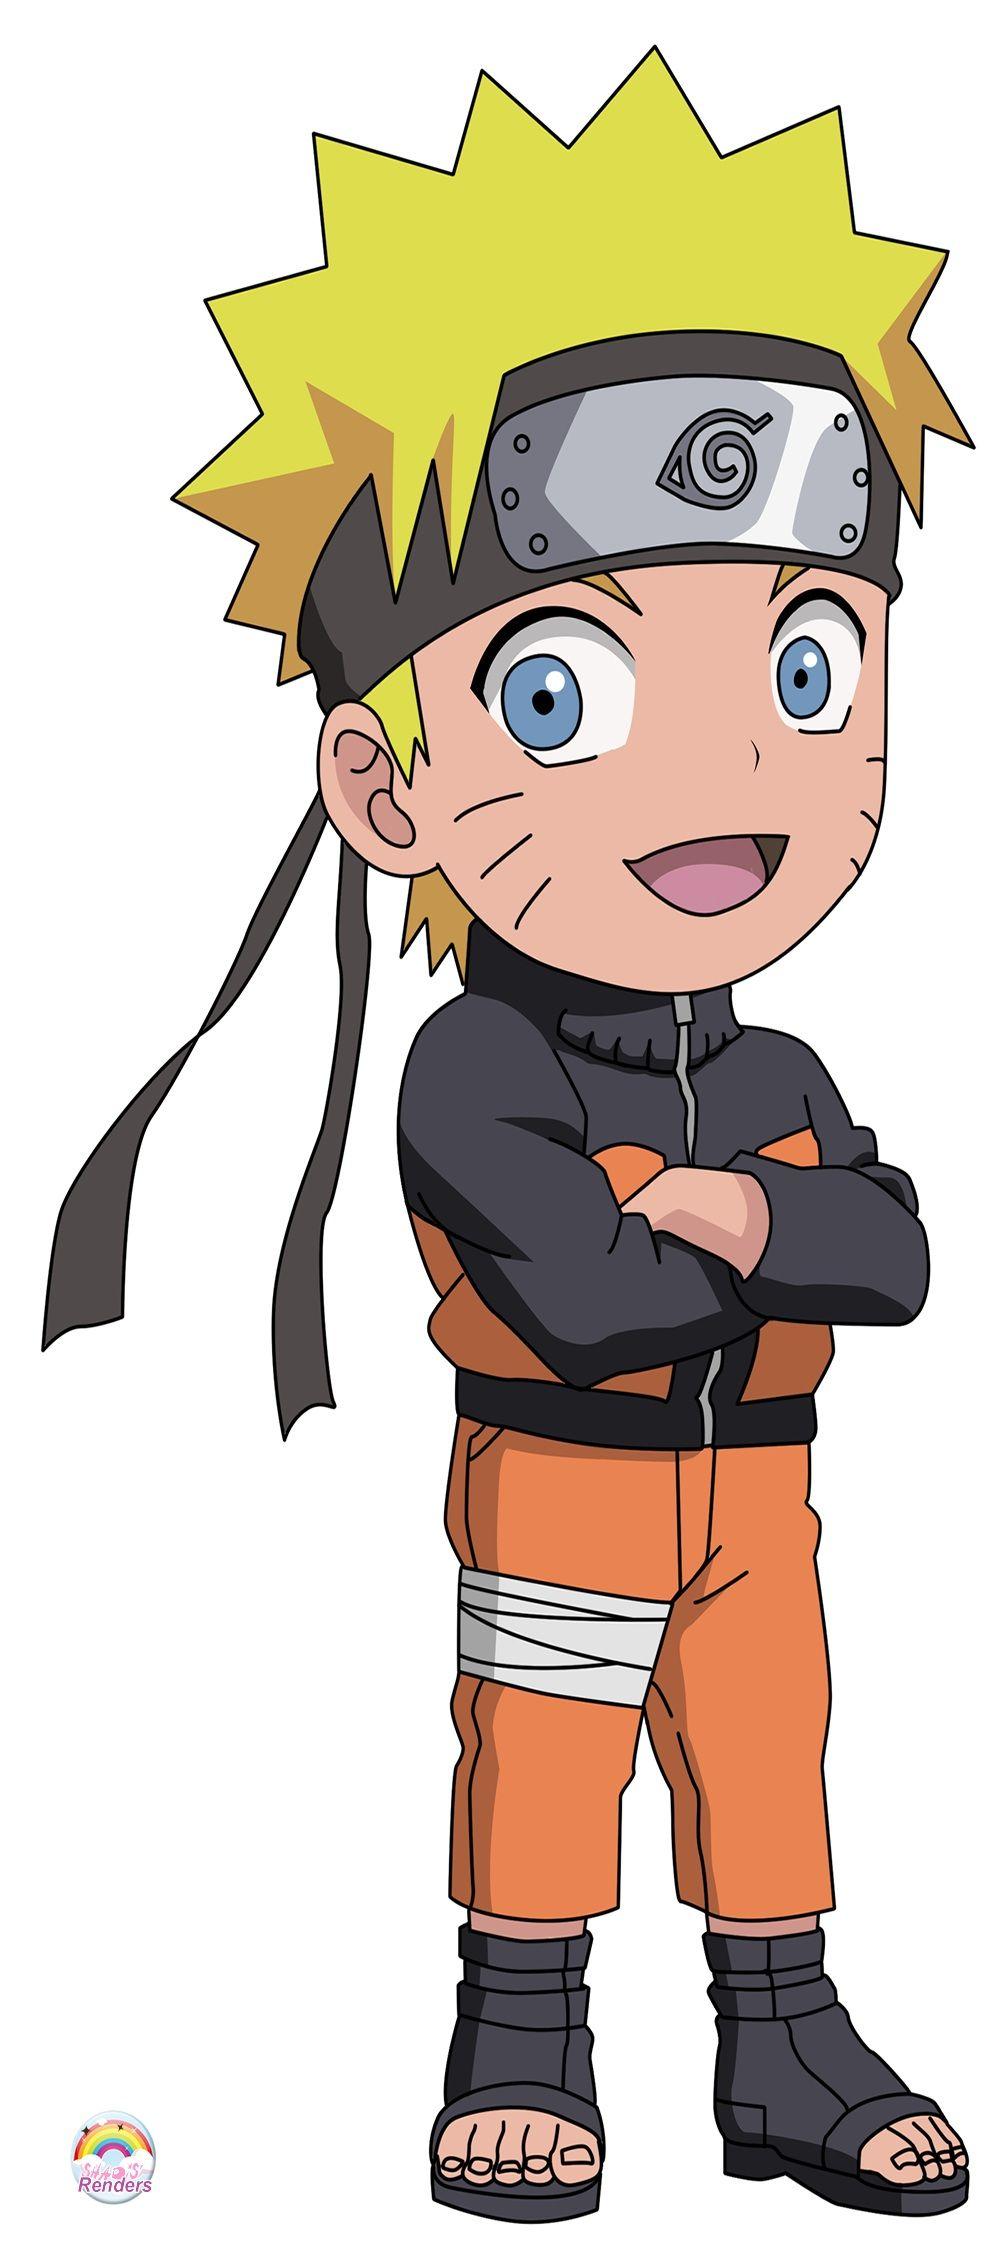 naruto chibi 24 anime 1 Pinterest Naruto, Chibi and